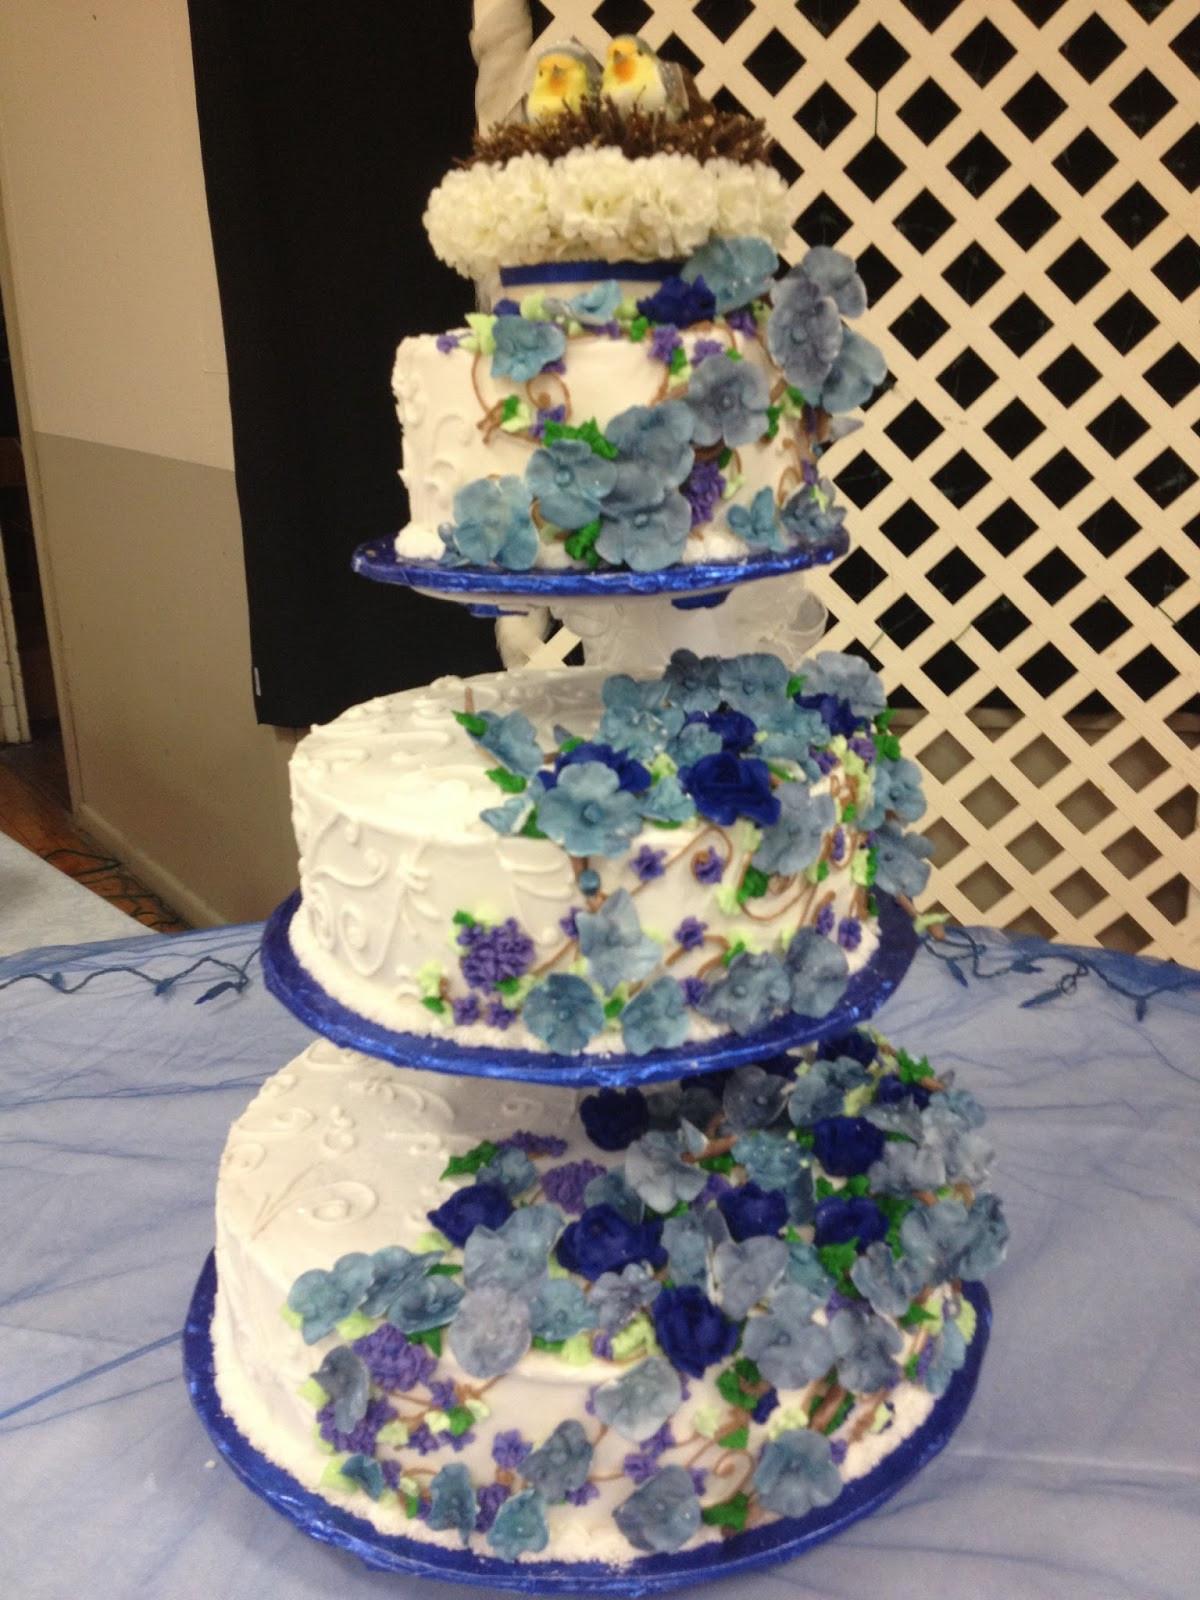 Nature Themed Wedding Cakes  Life and Other Shenanigans Nature Inspired Wedding Cake